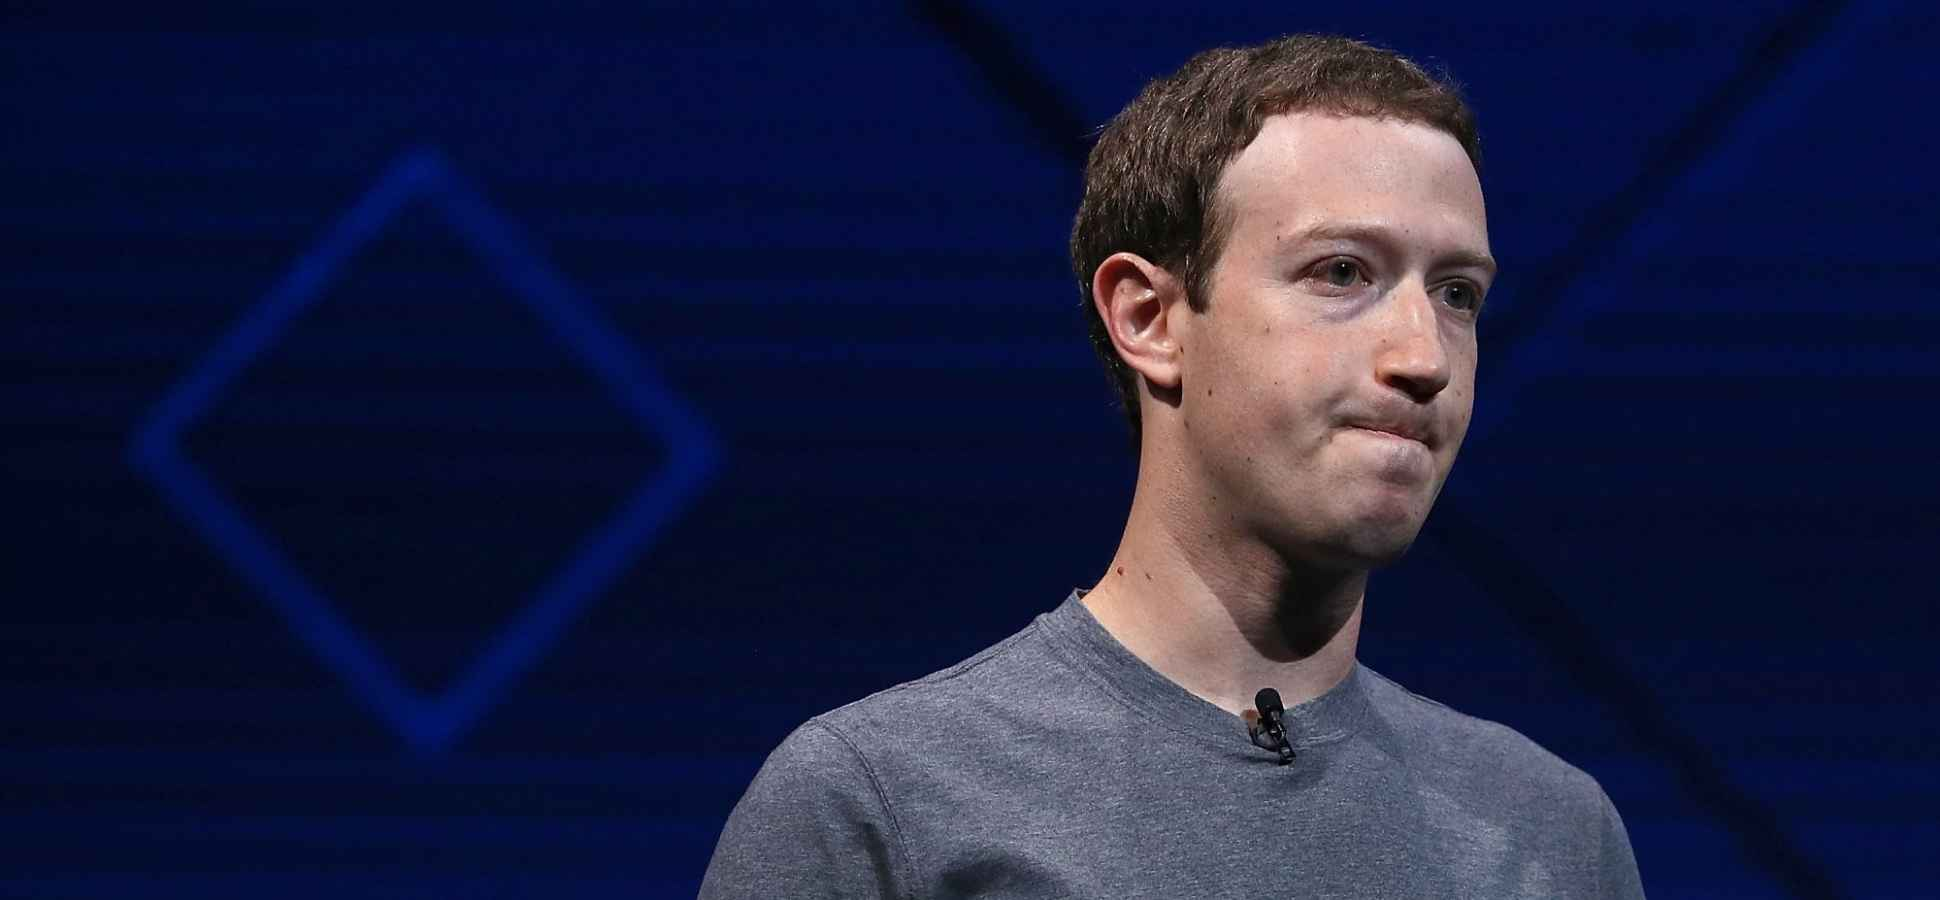 Mark Zuckerberg Thinks Elon Musk's Views on Artificial Intelligence Are 'Pretty Irresponsible'